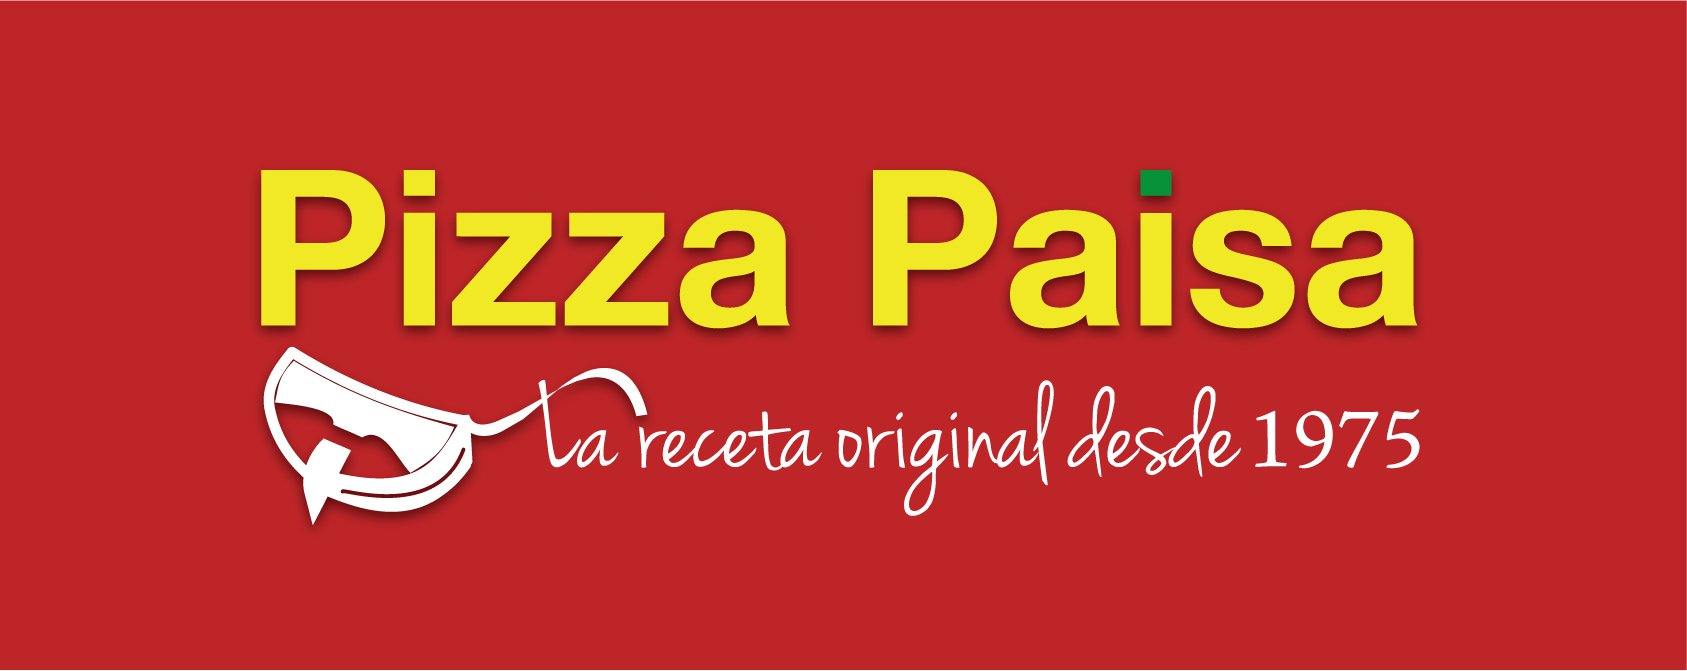 Pizza Paisa la 70